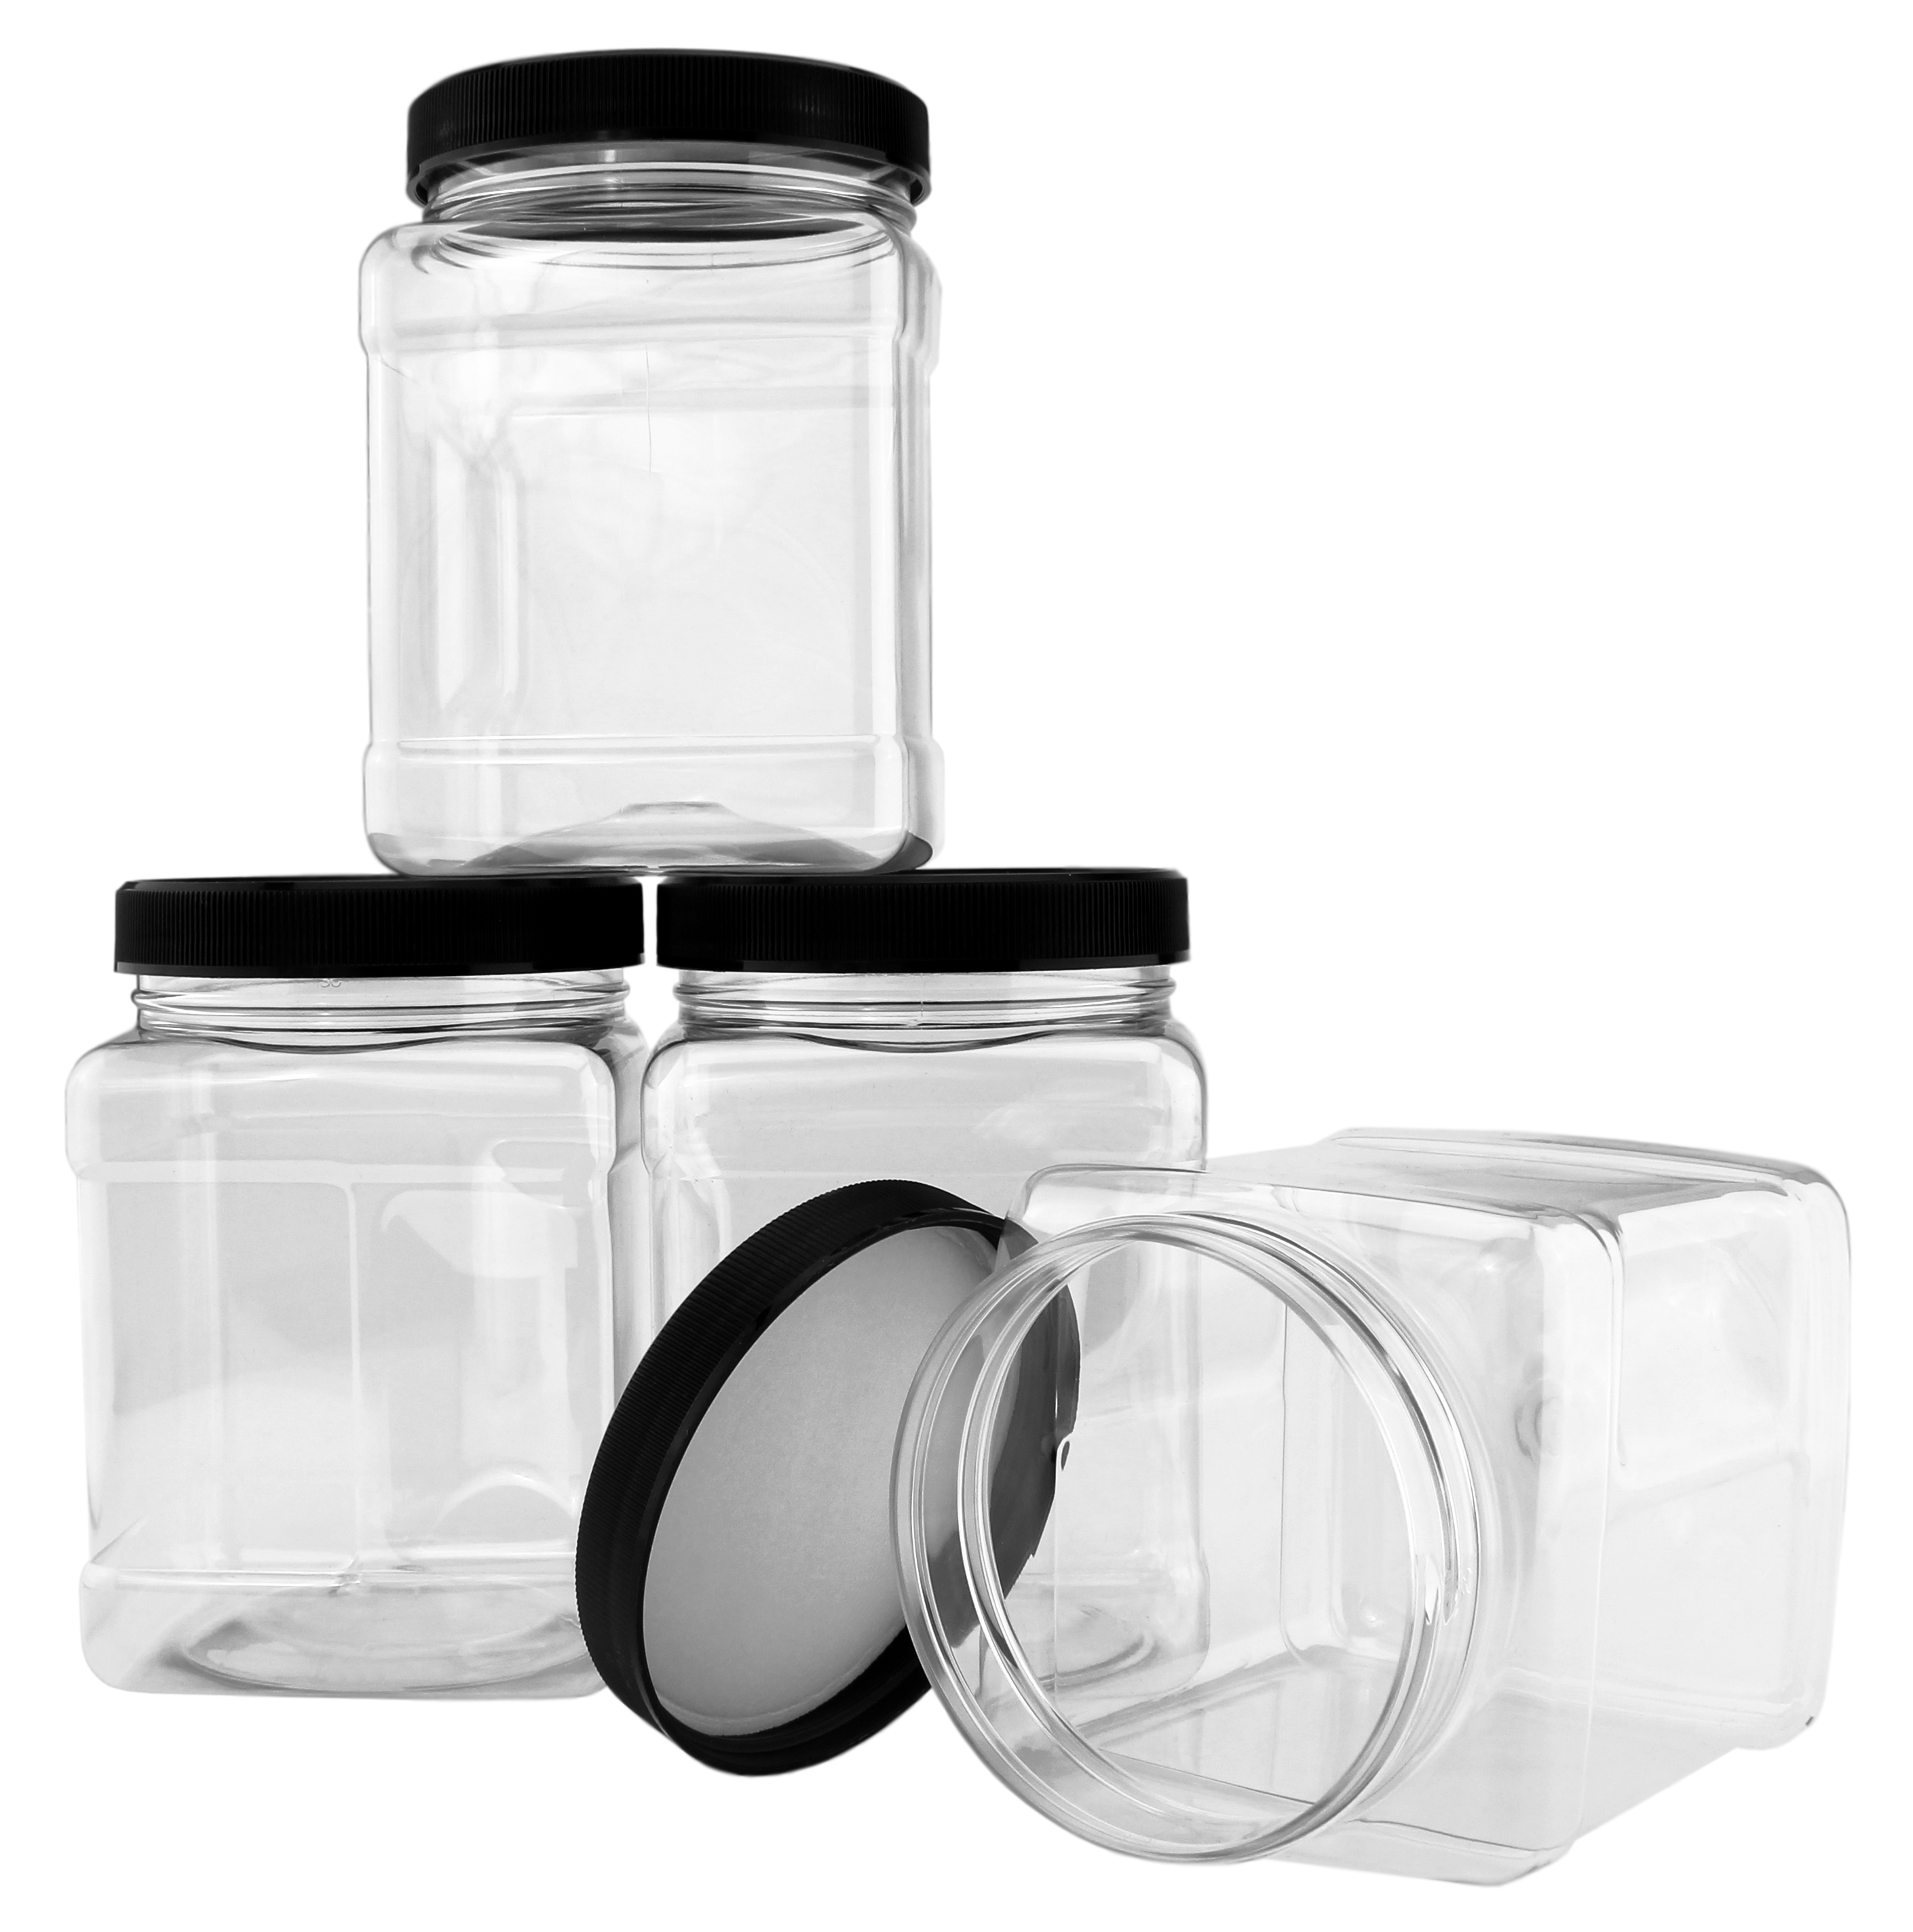 Plastic Jars Cornucopiabrands